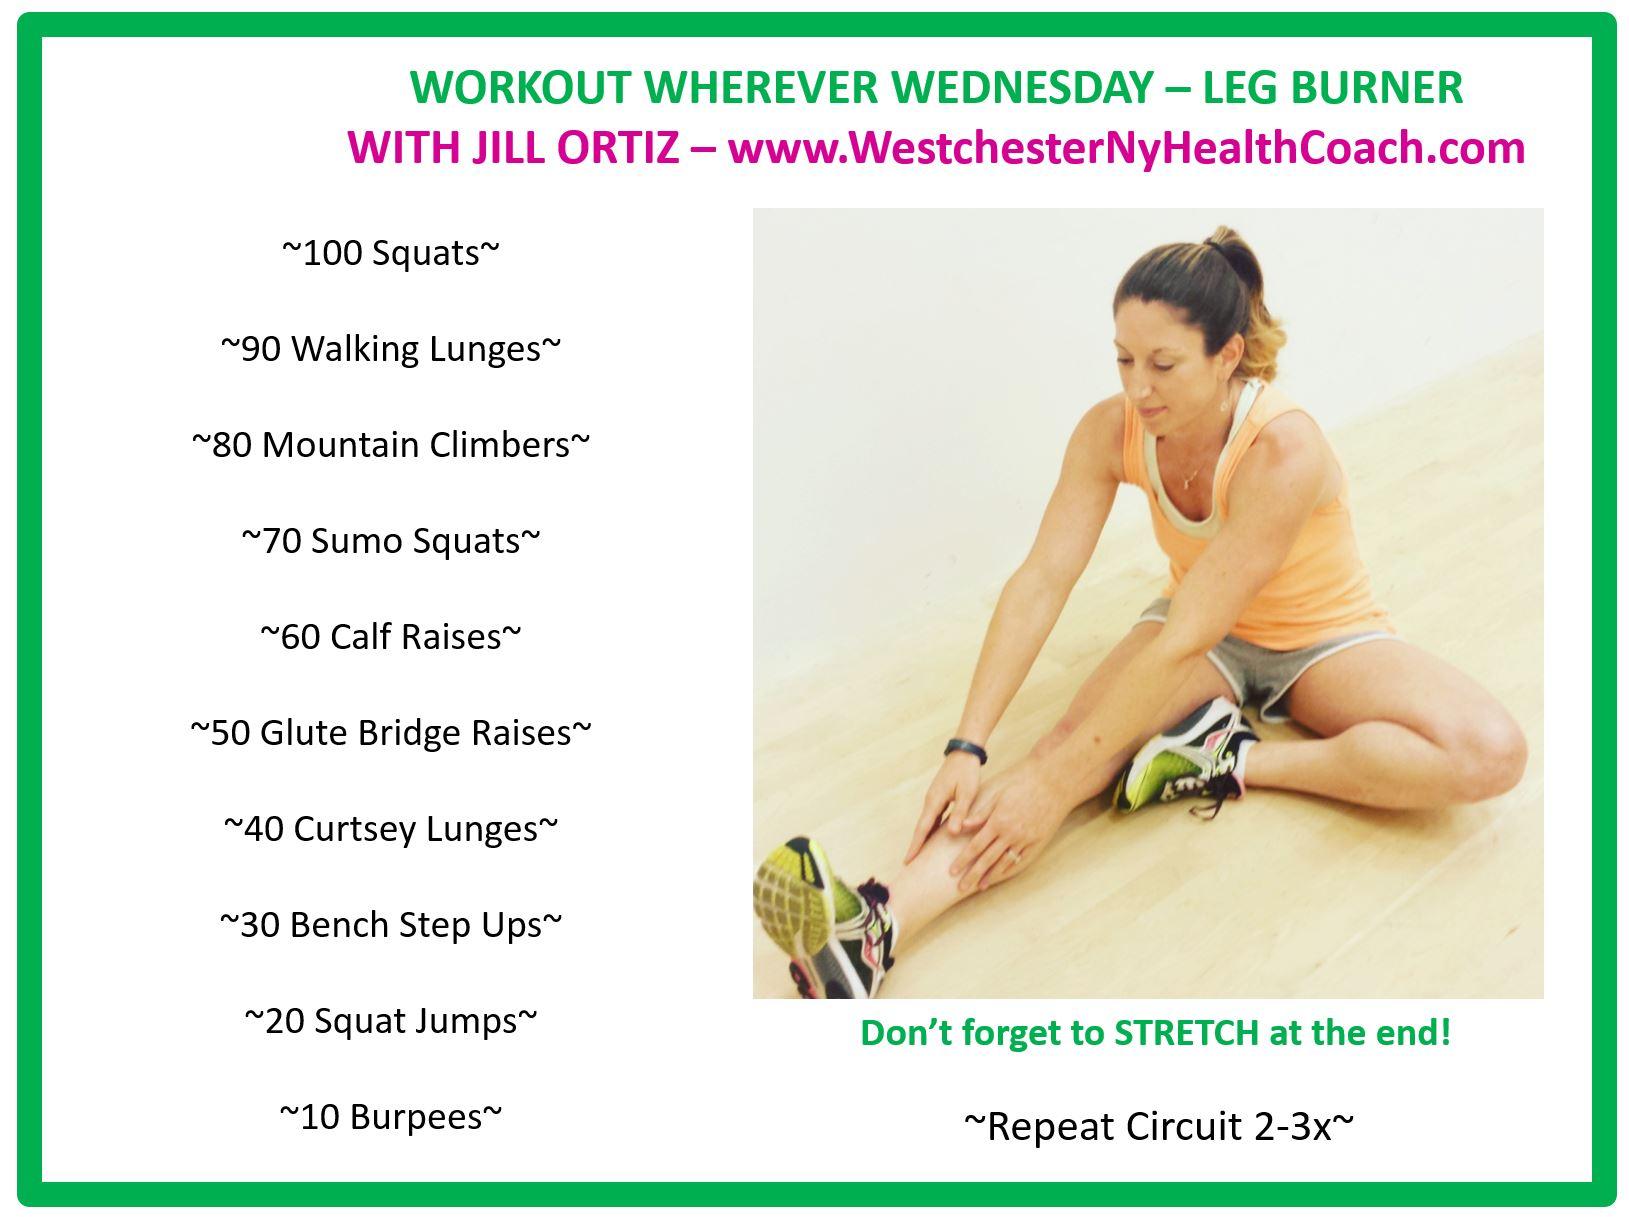 Workout Wherever Wednesday - 9.JPG